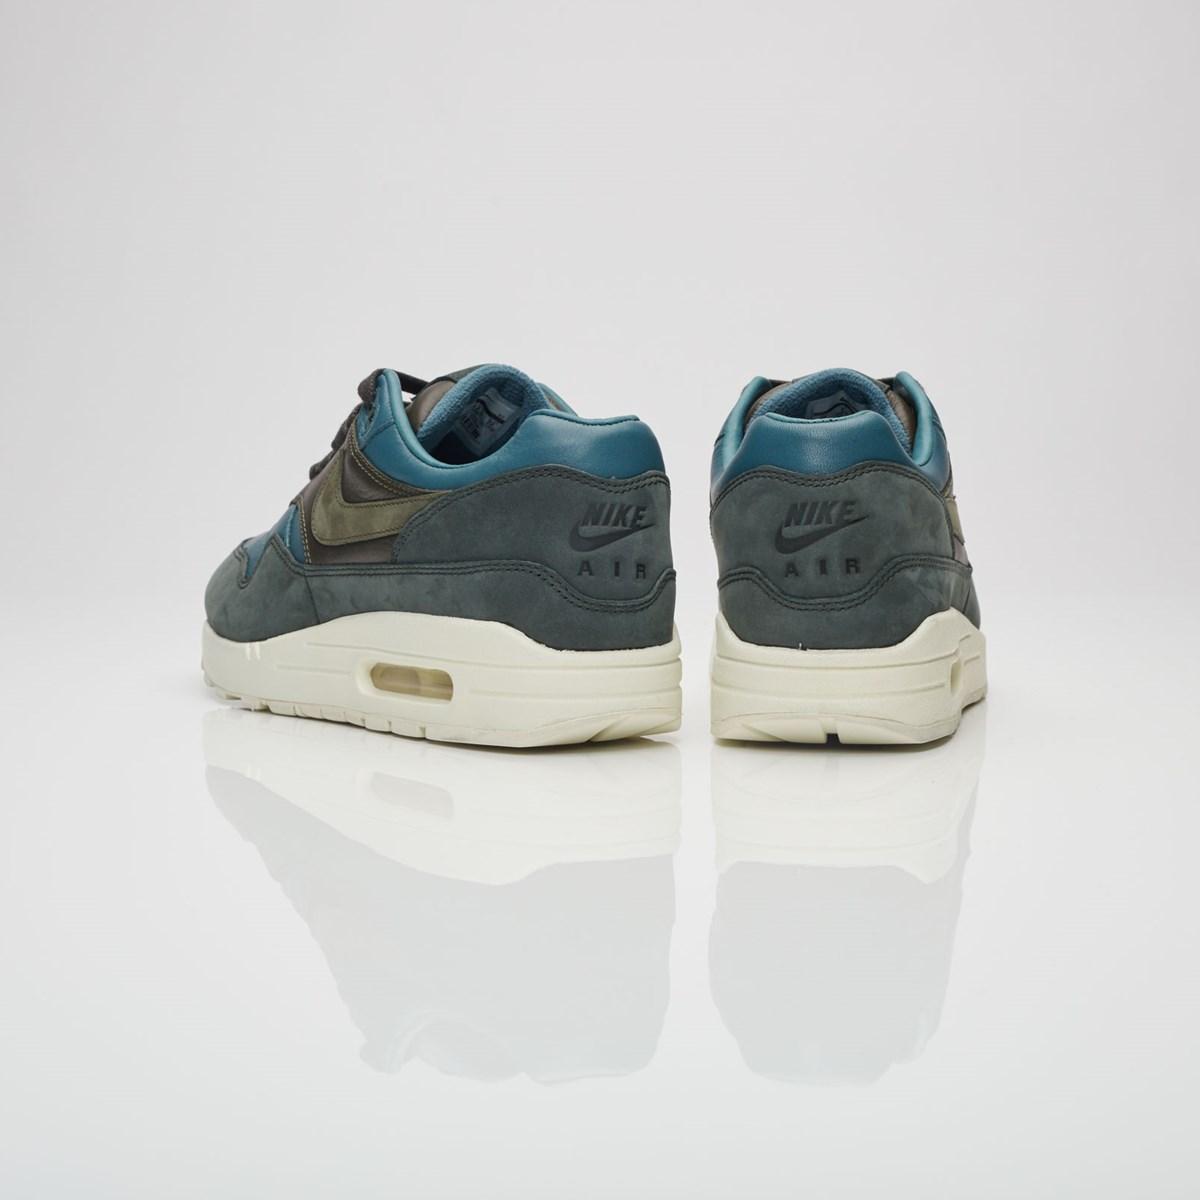 watch 1037a fe3e4 Nike Air Max 1 Pinnacle - 859554-300 - Sneakersnstuff | Sneaker &  Streetwear online seit 1999